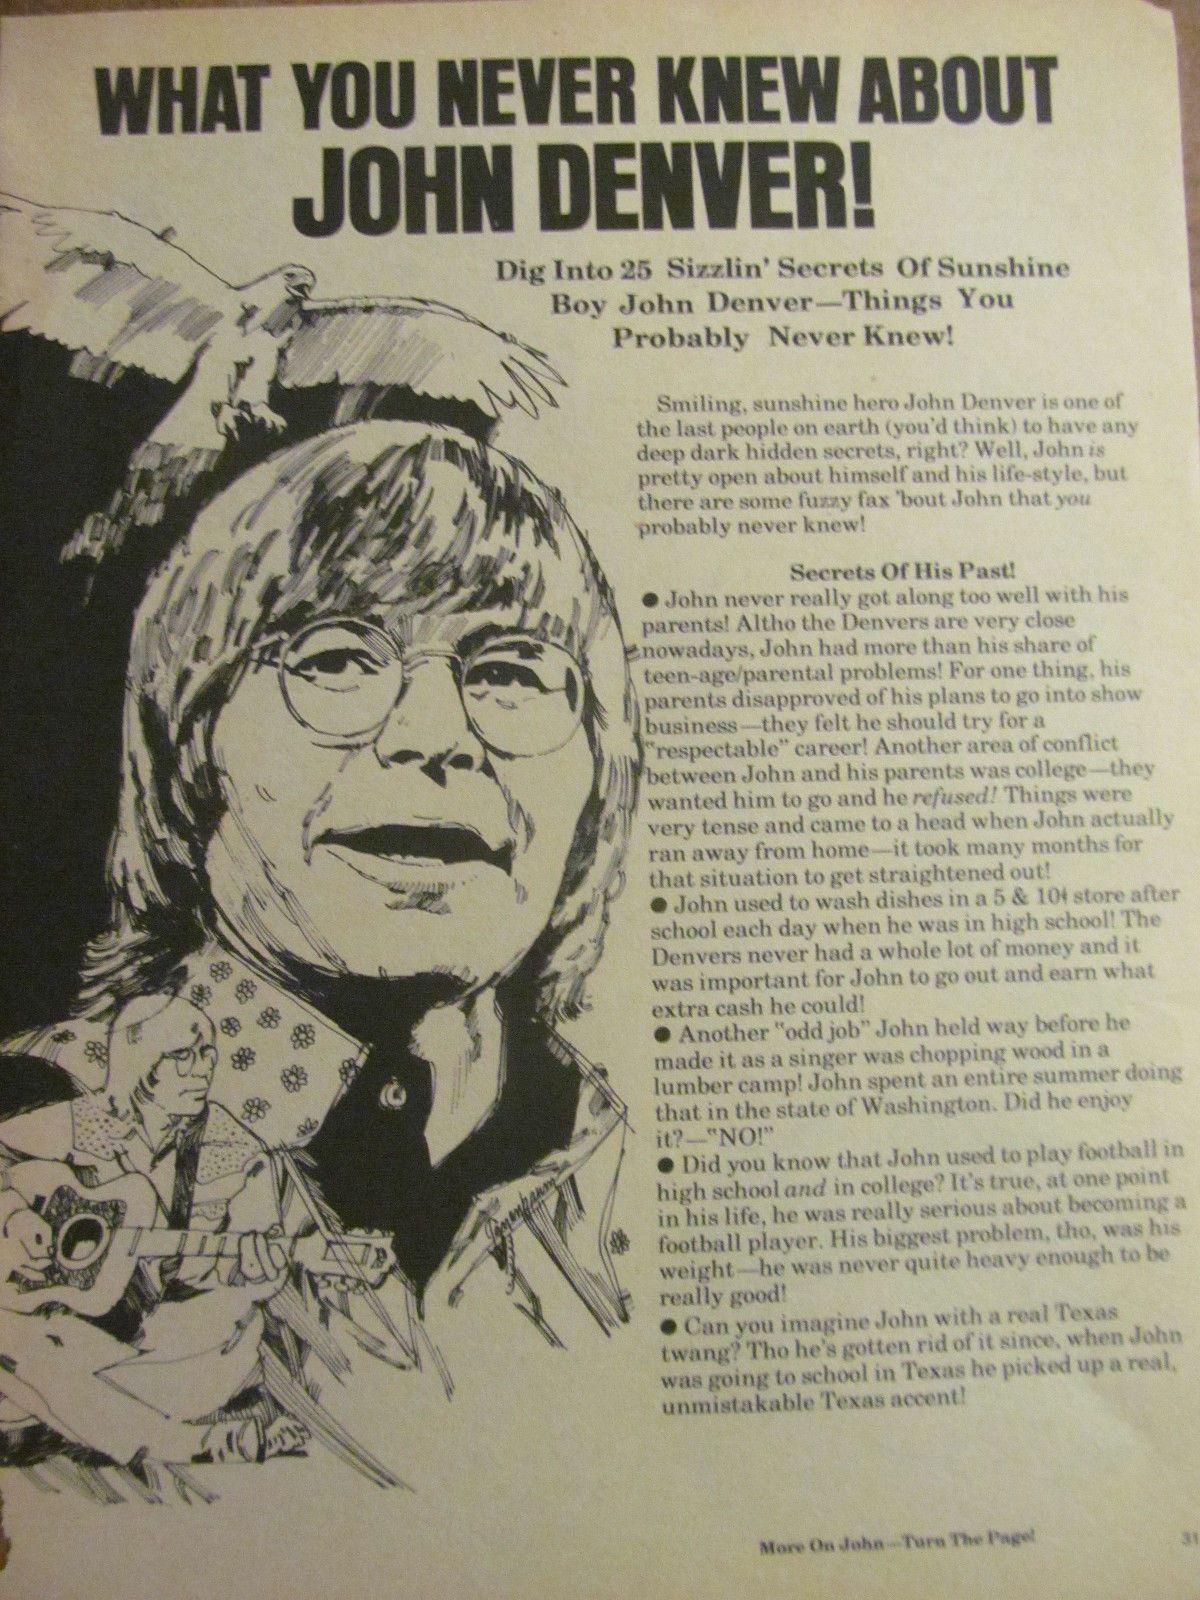 John denver grandma s feather bed sheet music - John Denver Full Page Vintage Clipping In Entertainment Memorabilia Music Memorabilia Rock Pop